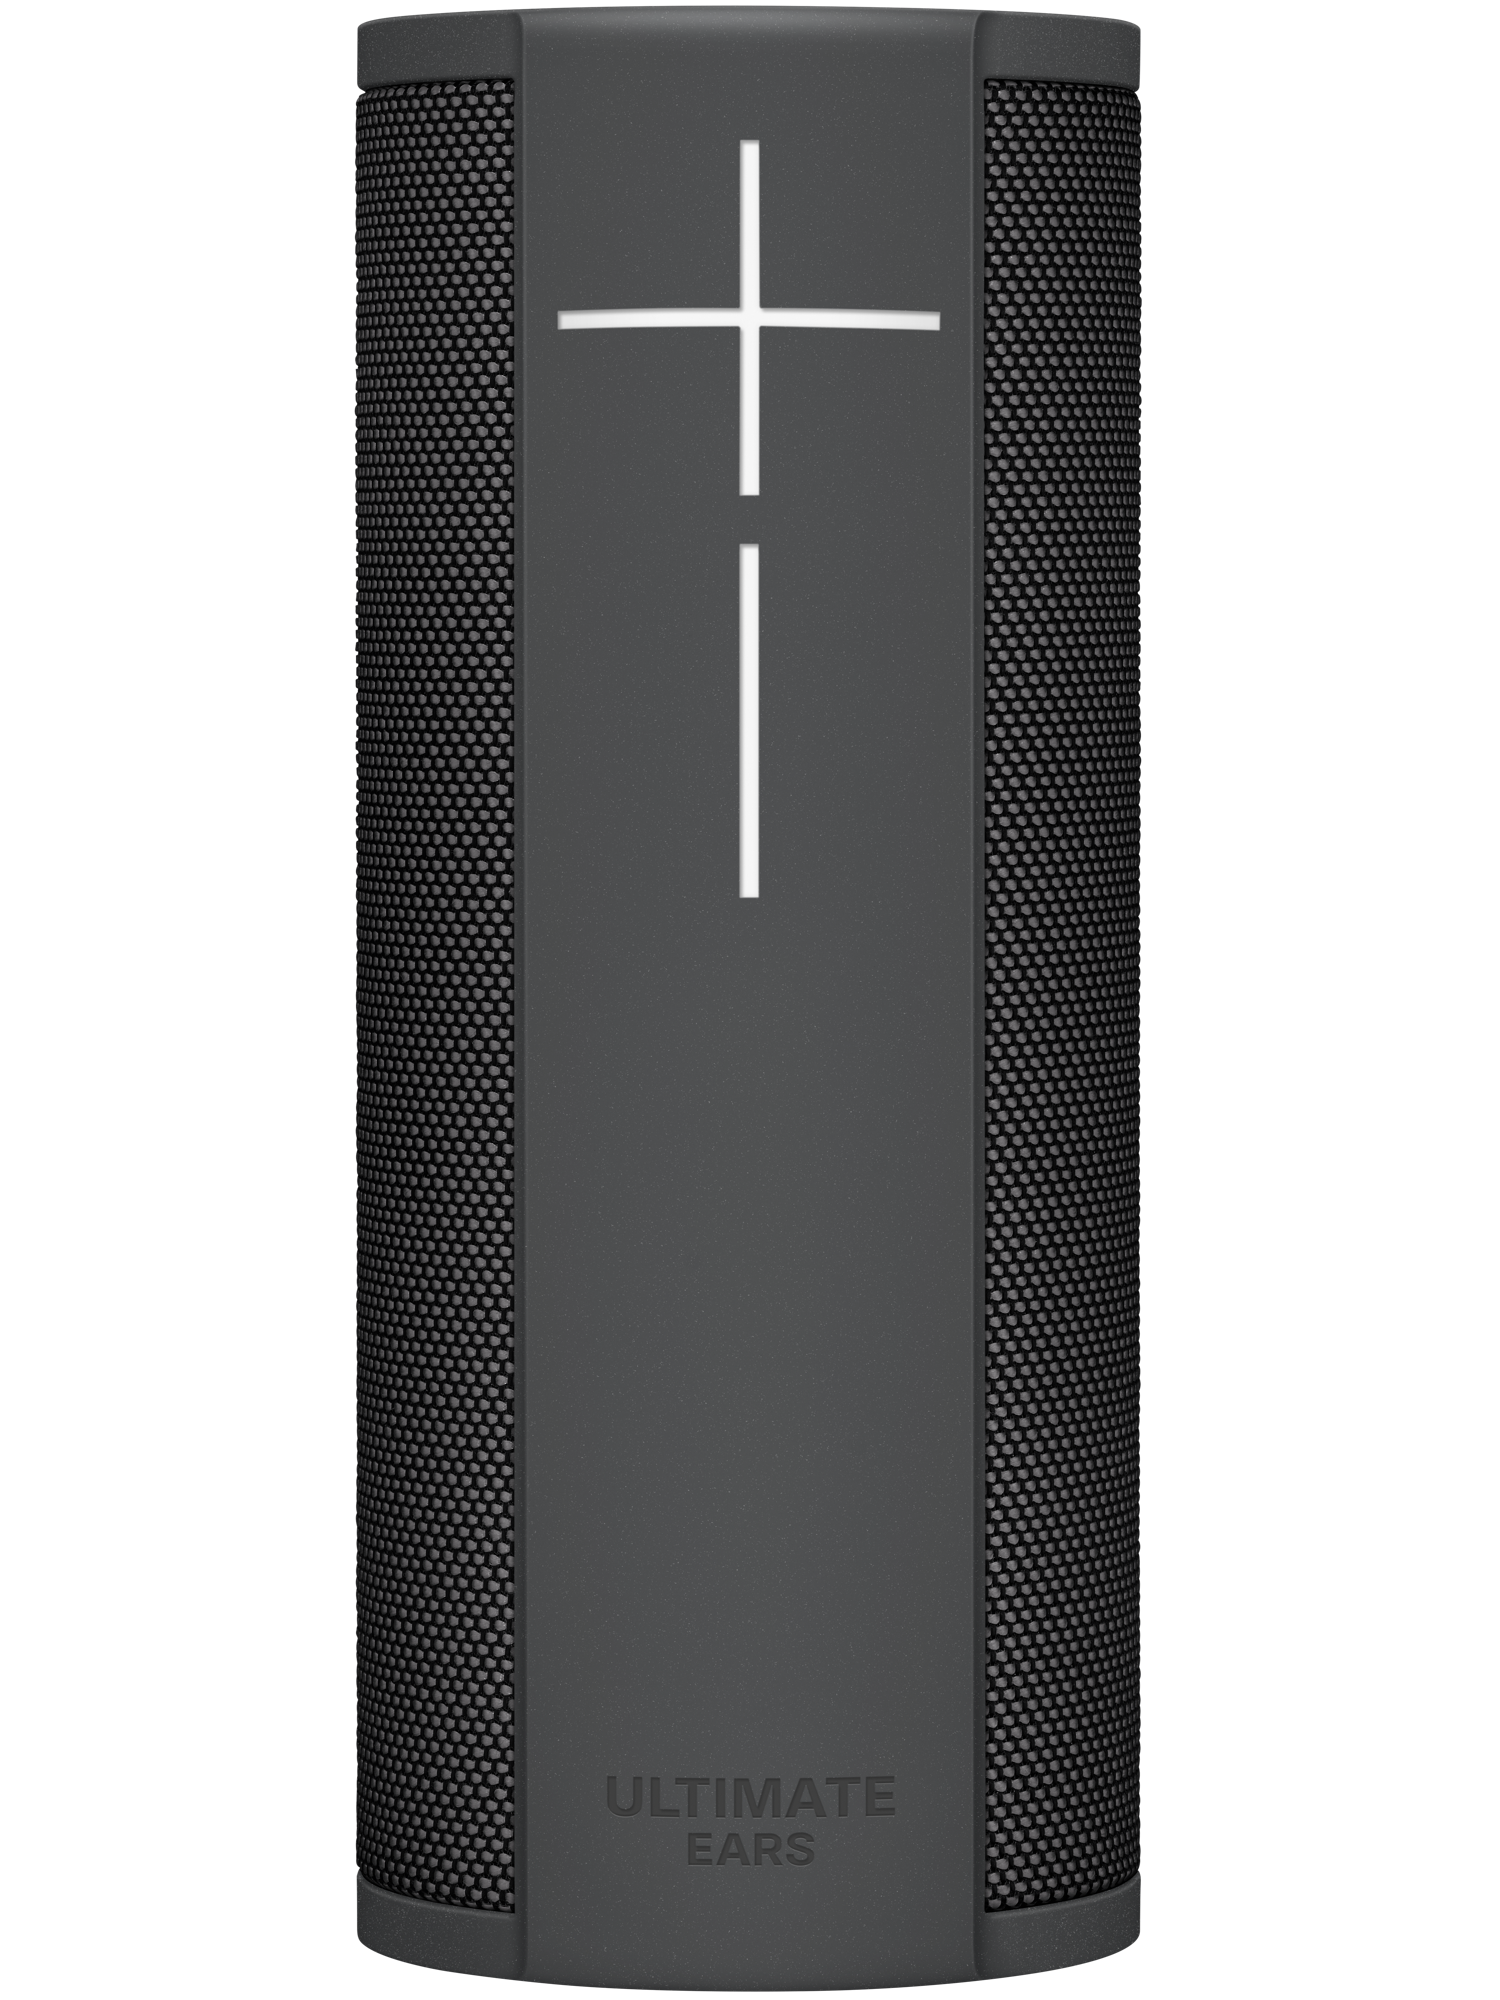 ultimate mega blaster speaker amazon